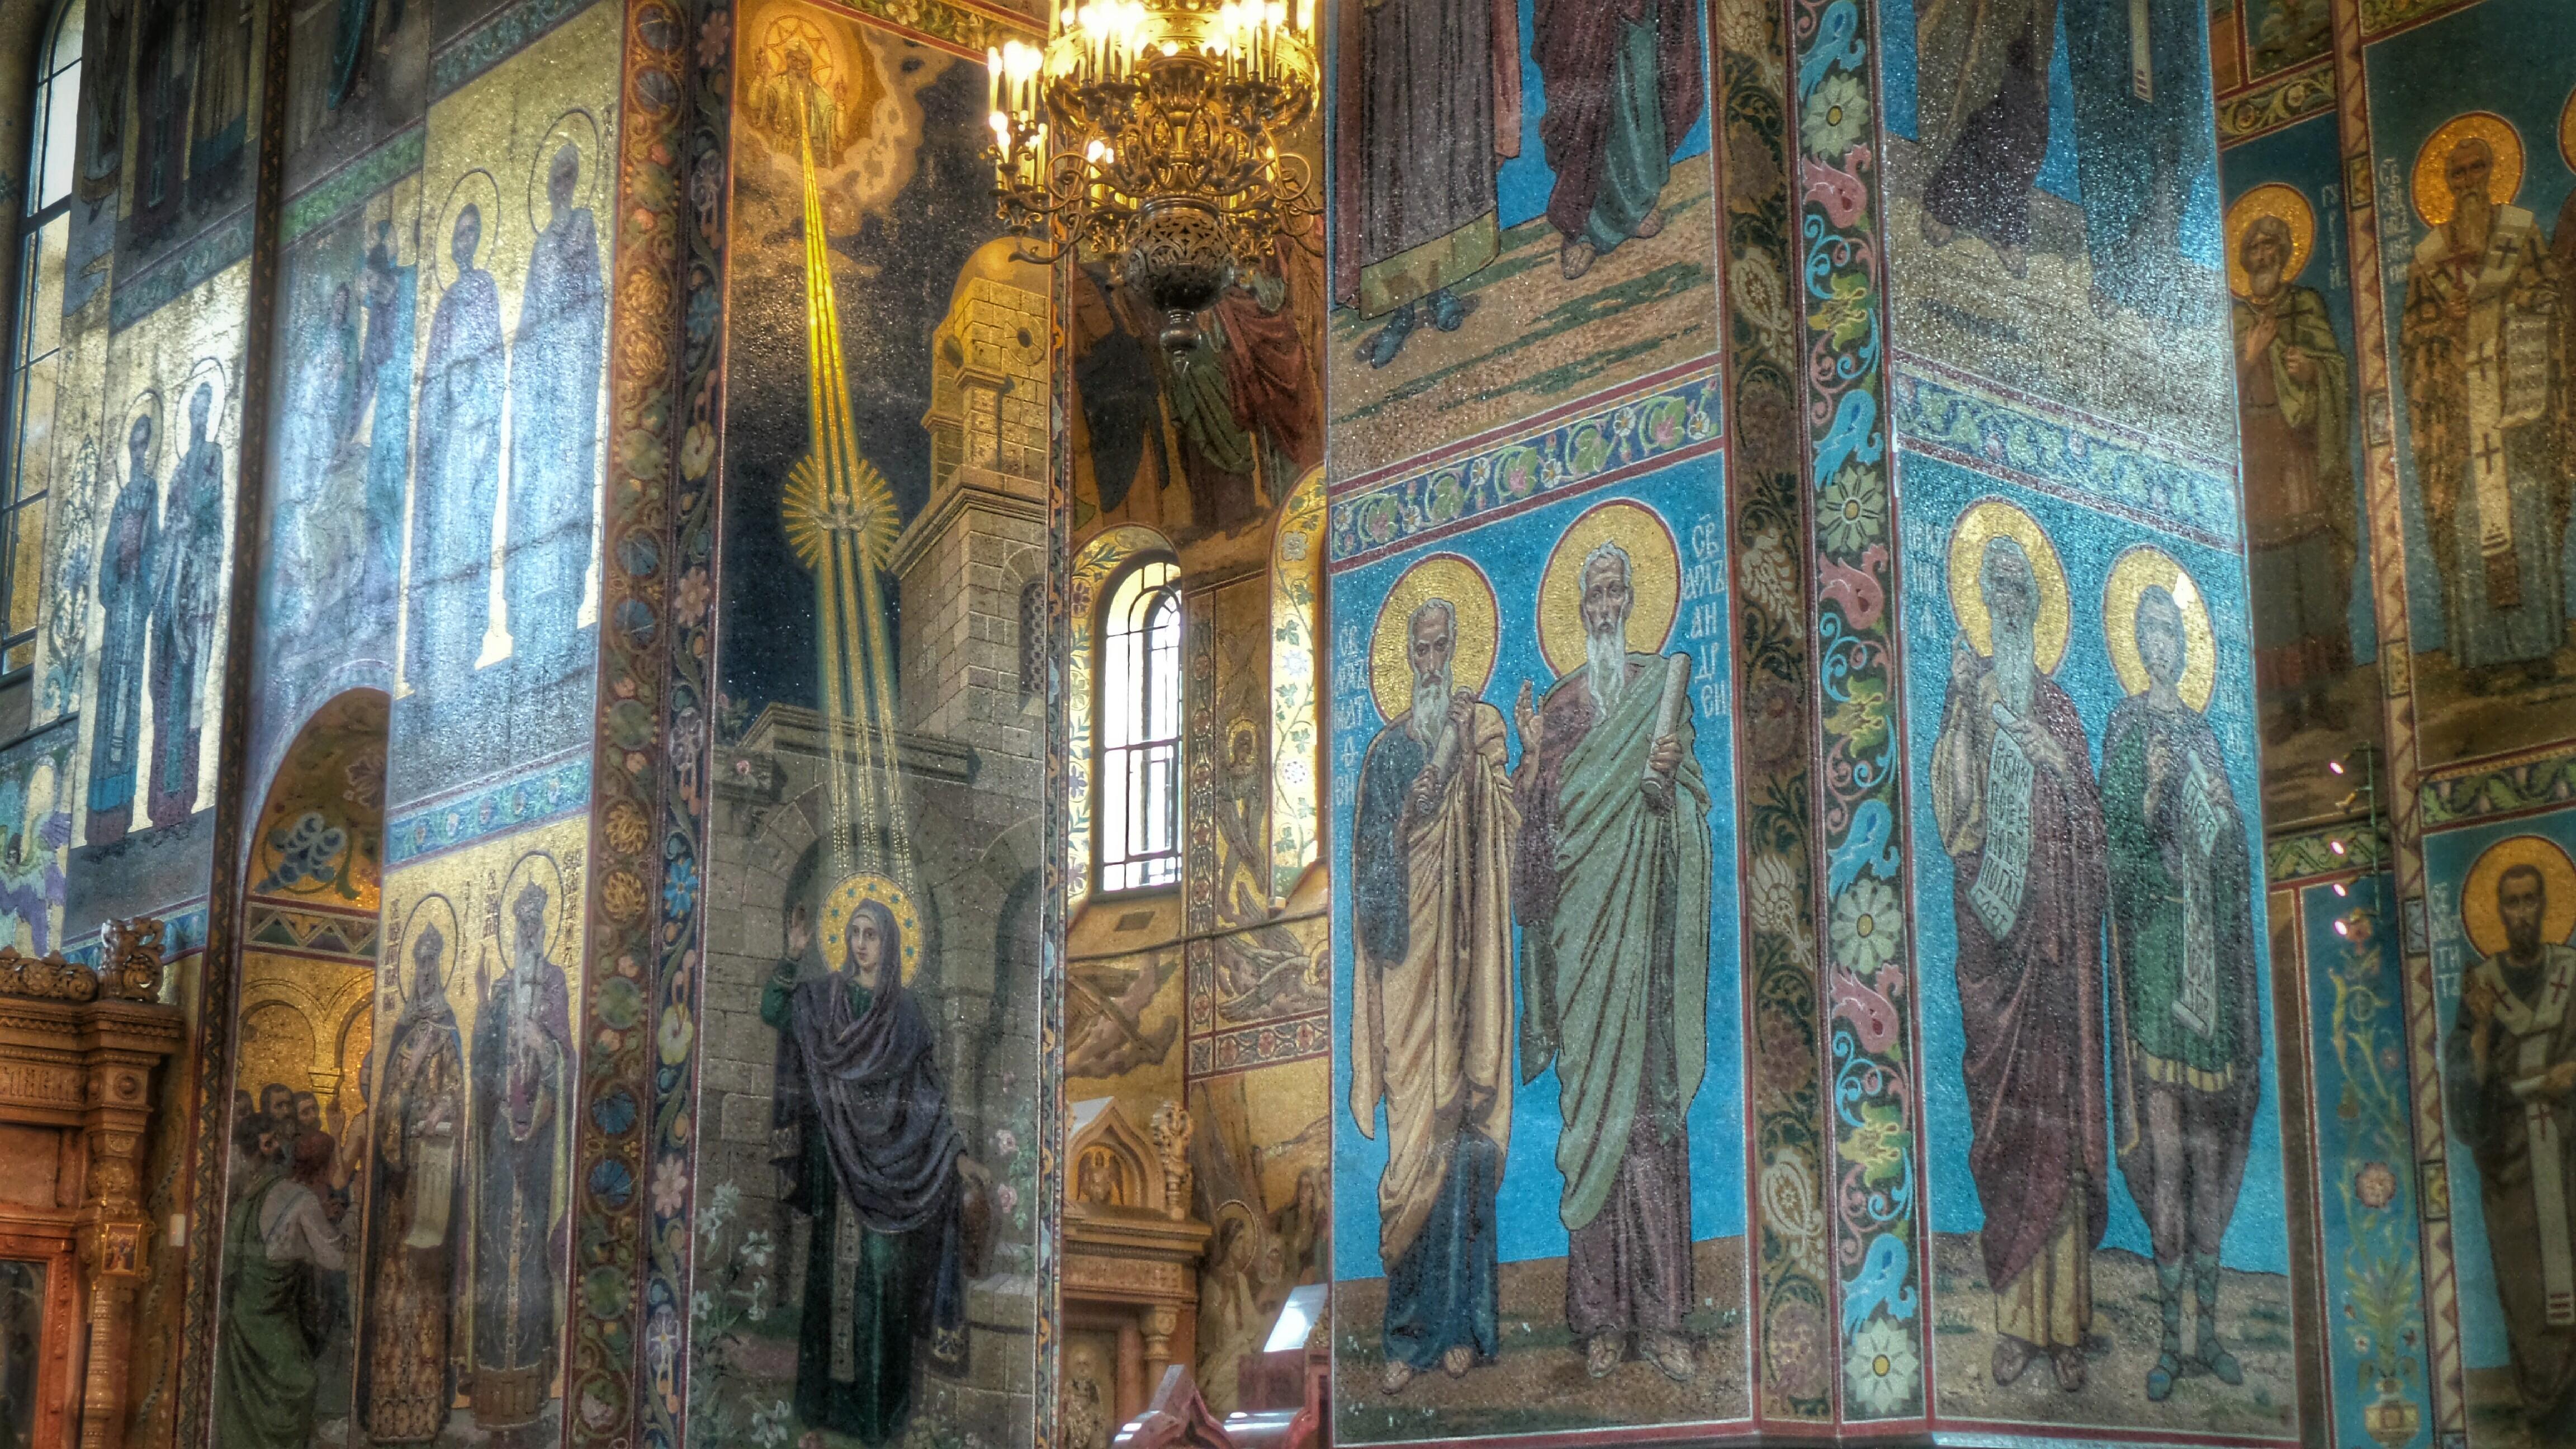 Flickr - St Petersburg, mosaici nella Chiesa del Salvatore sul sangue versato